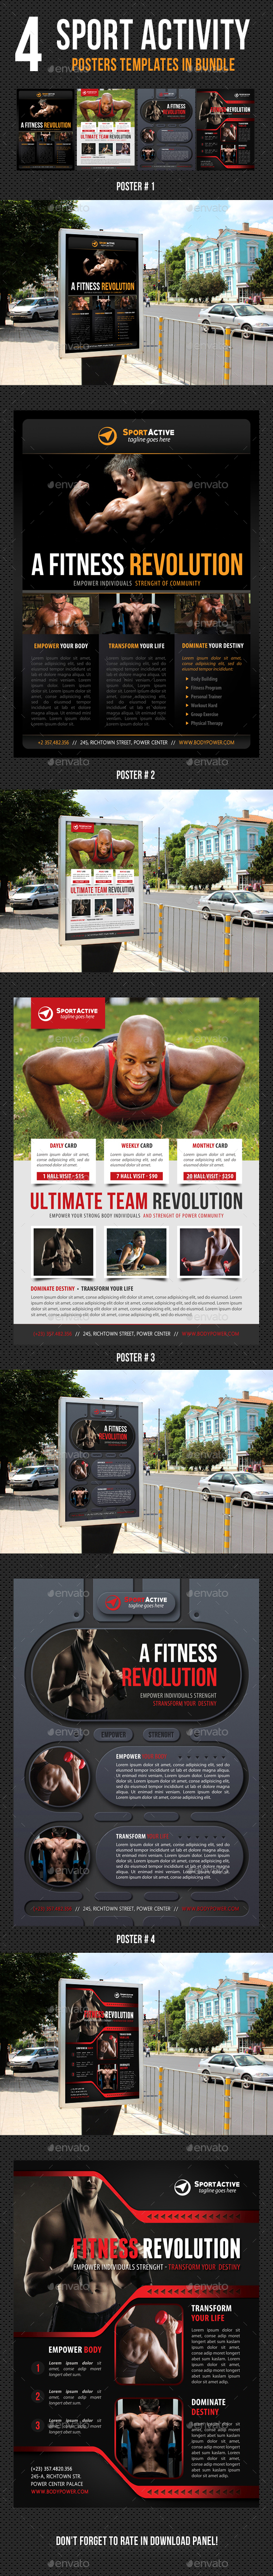 4 in 1 Sport Activity Poster Bundle V03 - Signage Print Templates